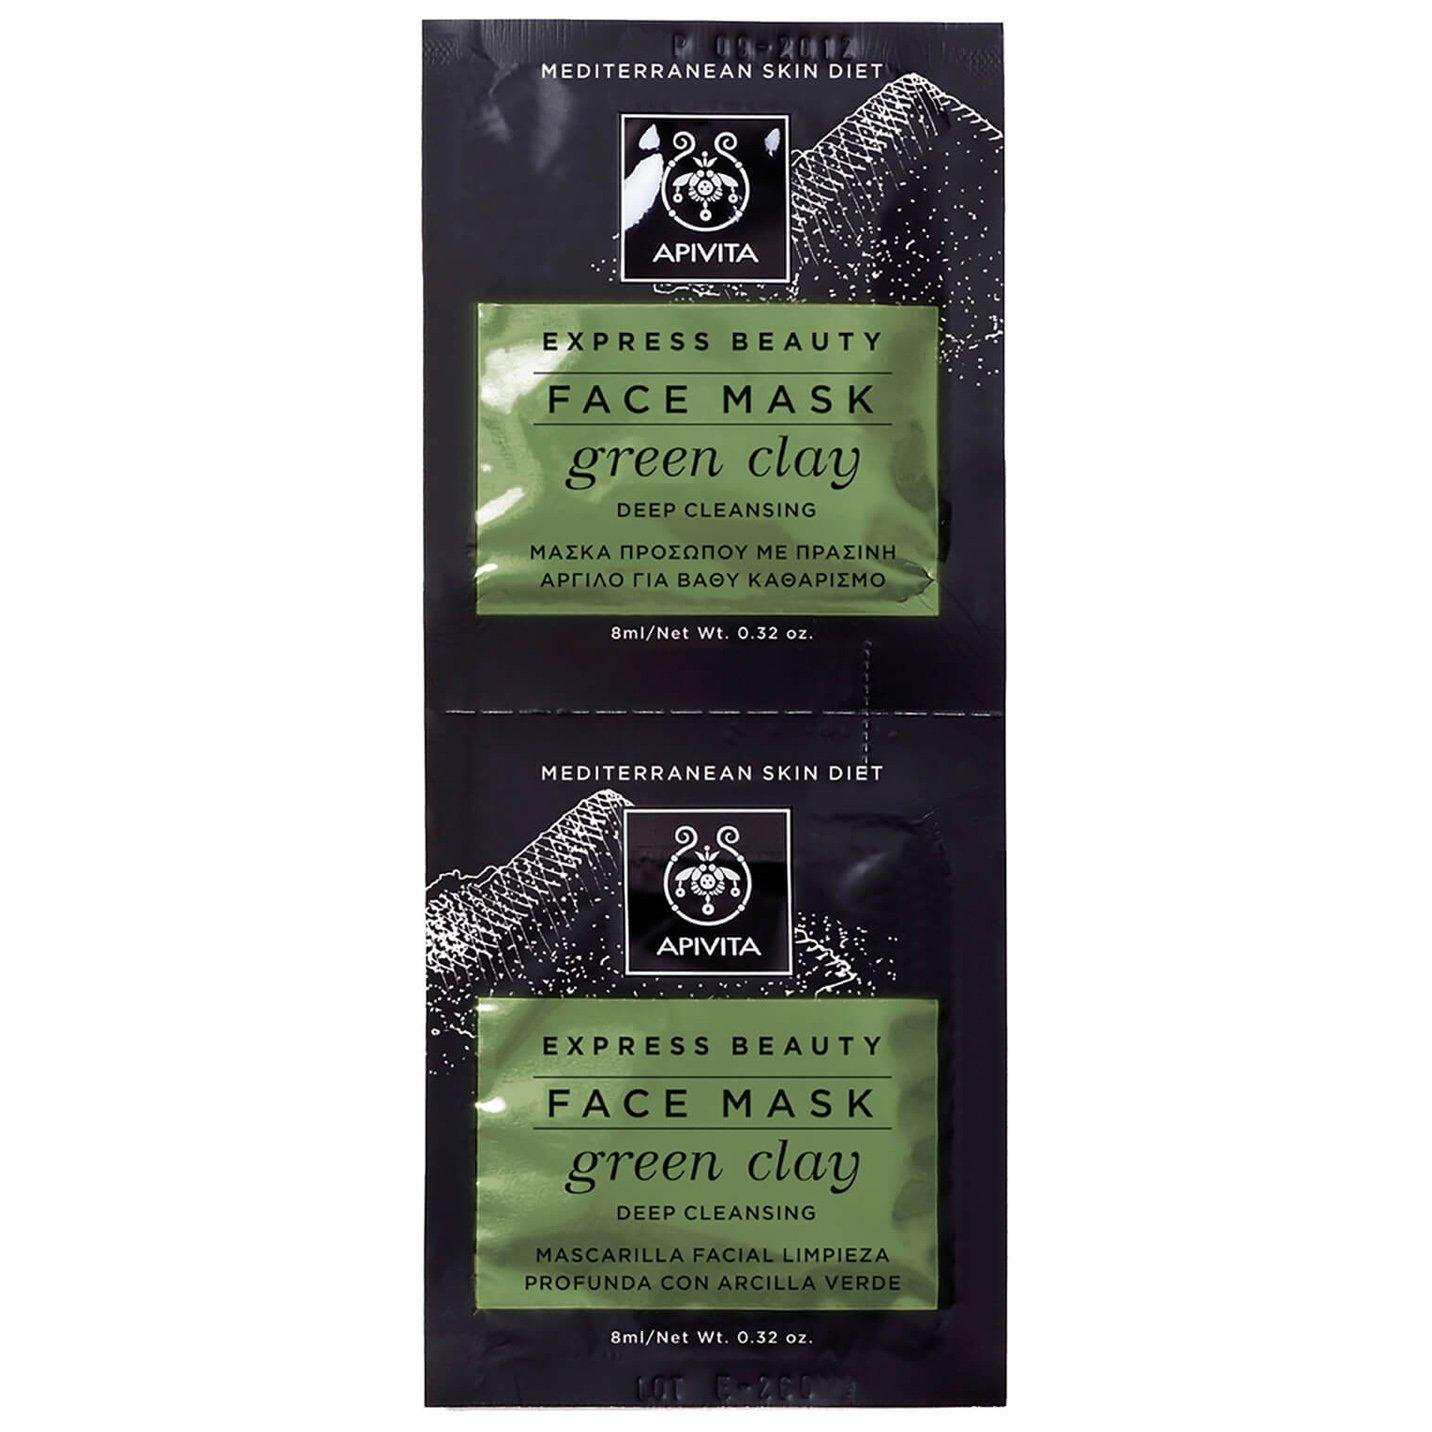 Express Beauty With Green Clay Μάσκα για Βαθύ Καθαρισμό με Πράσινη Άργιλο 2x8ml – Apivita,Ιδανική για Λιπαρές και Μεικτές Επιδερ